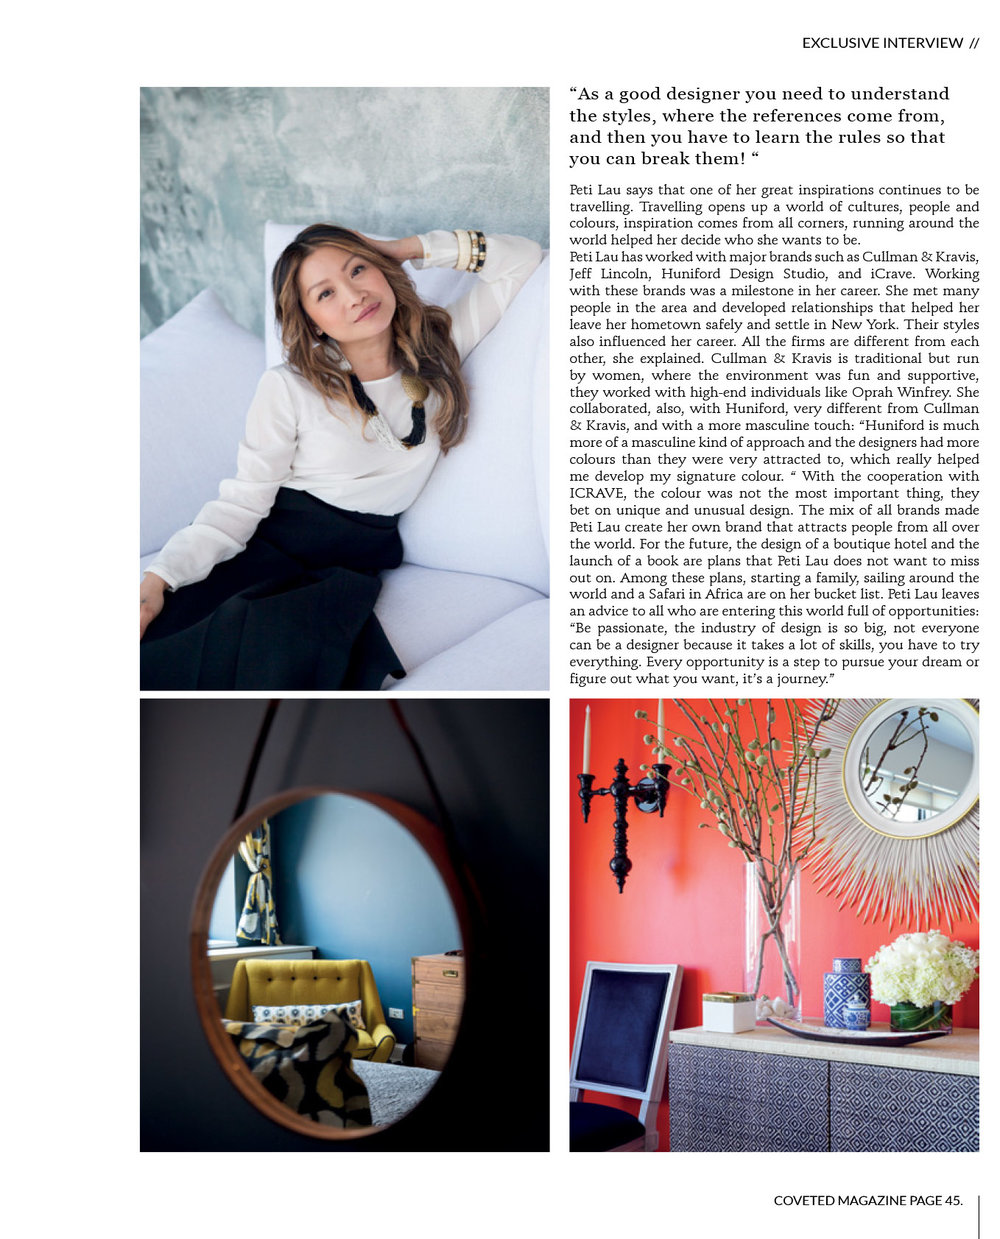 Covet-Edition-Magazine-11th-Edition-45.jpg